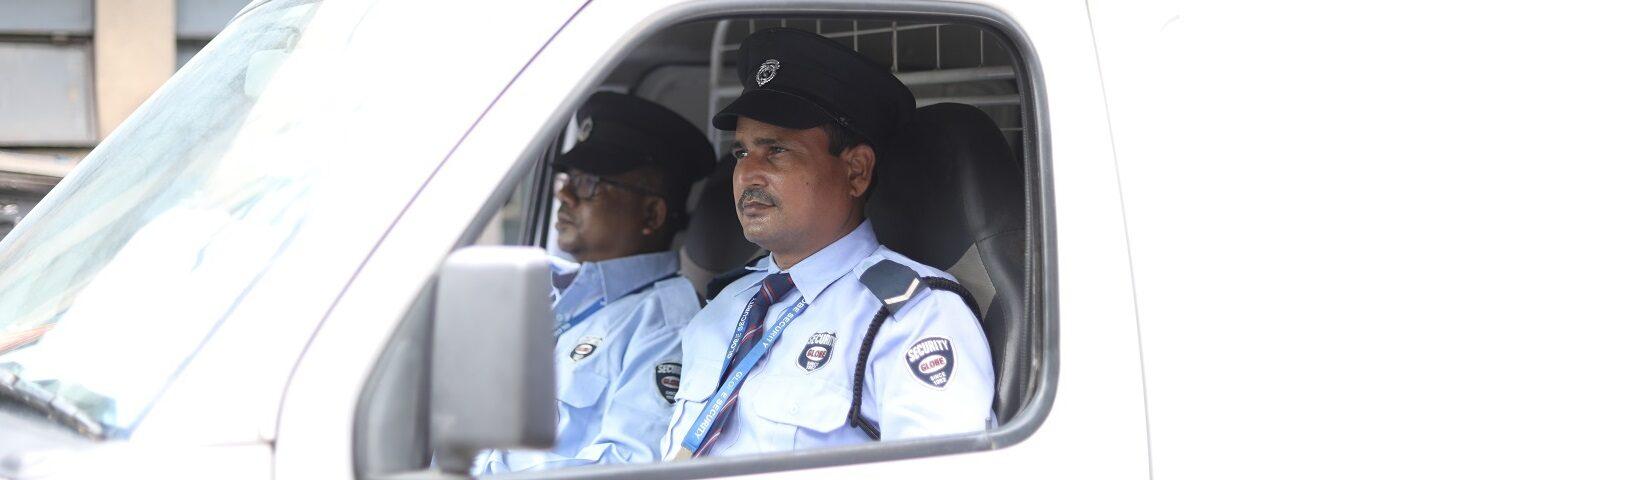 Escort Guards sitting inside vehicle in Mumbai